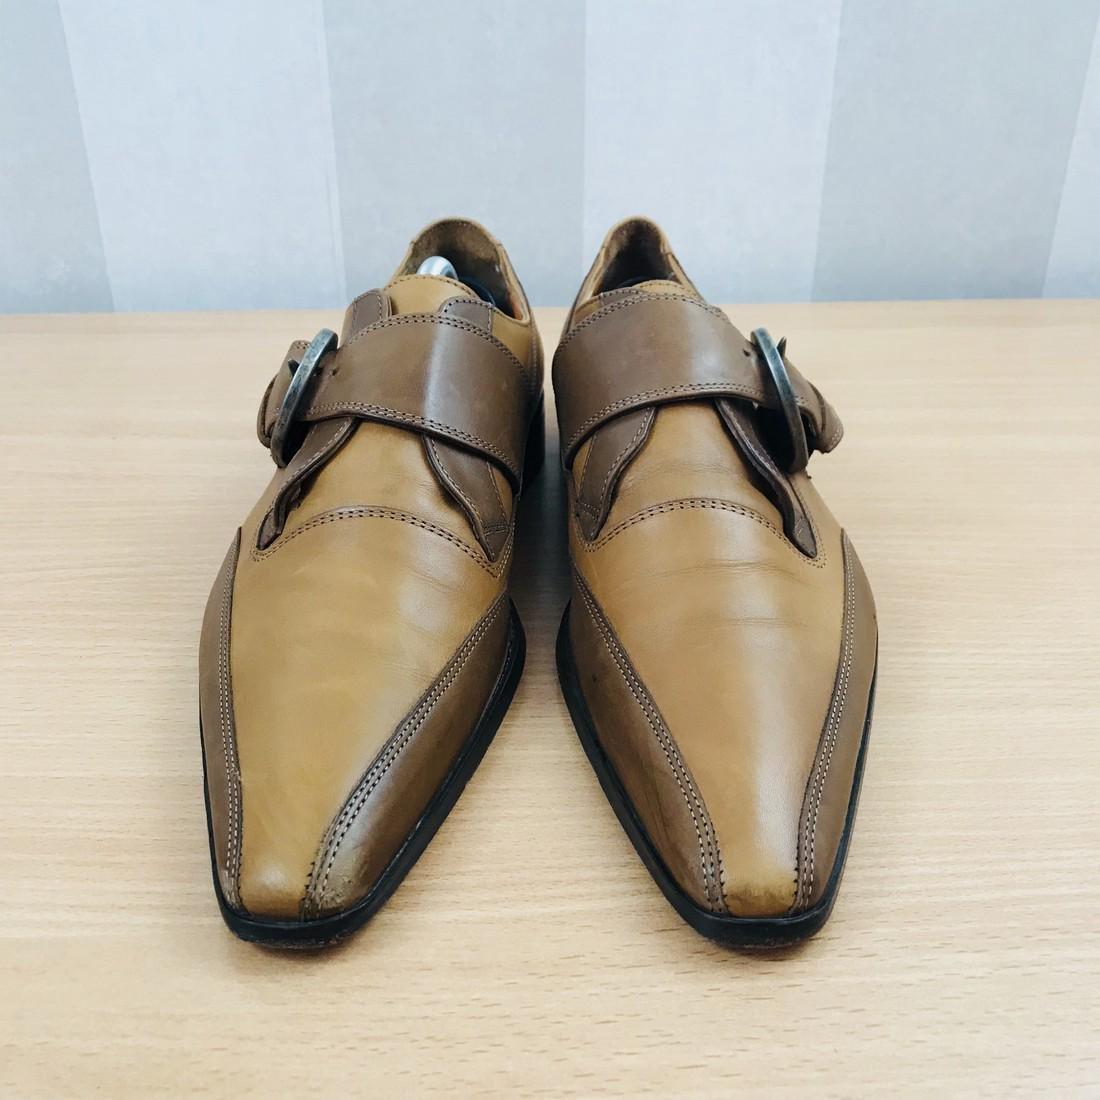 Dolce & Gabbana – Leather Shoes Size EUR 42 UK 8.5 US 9 - 3